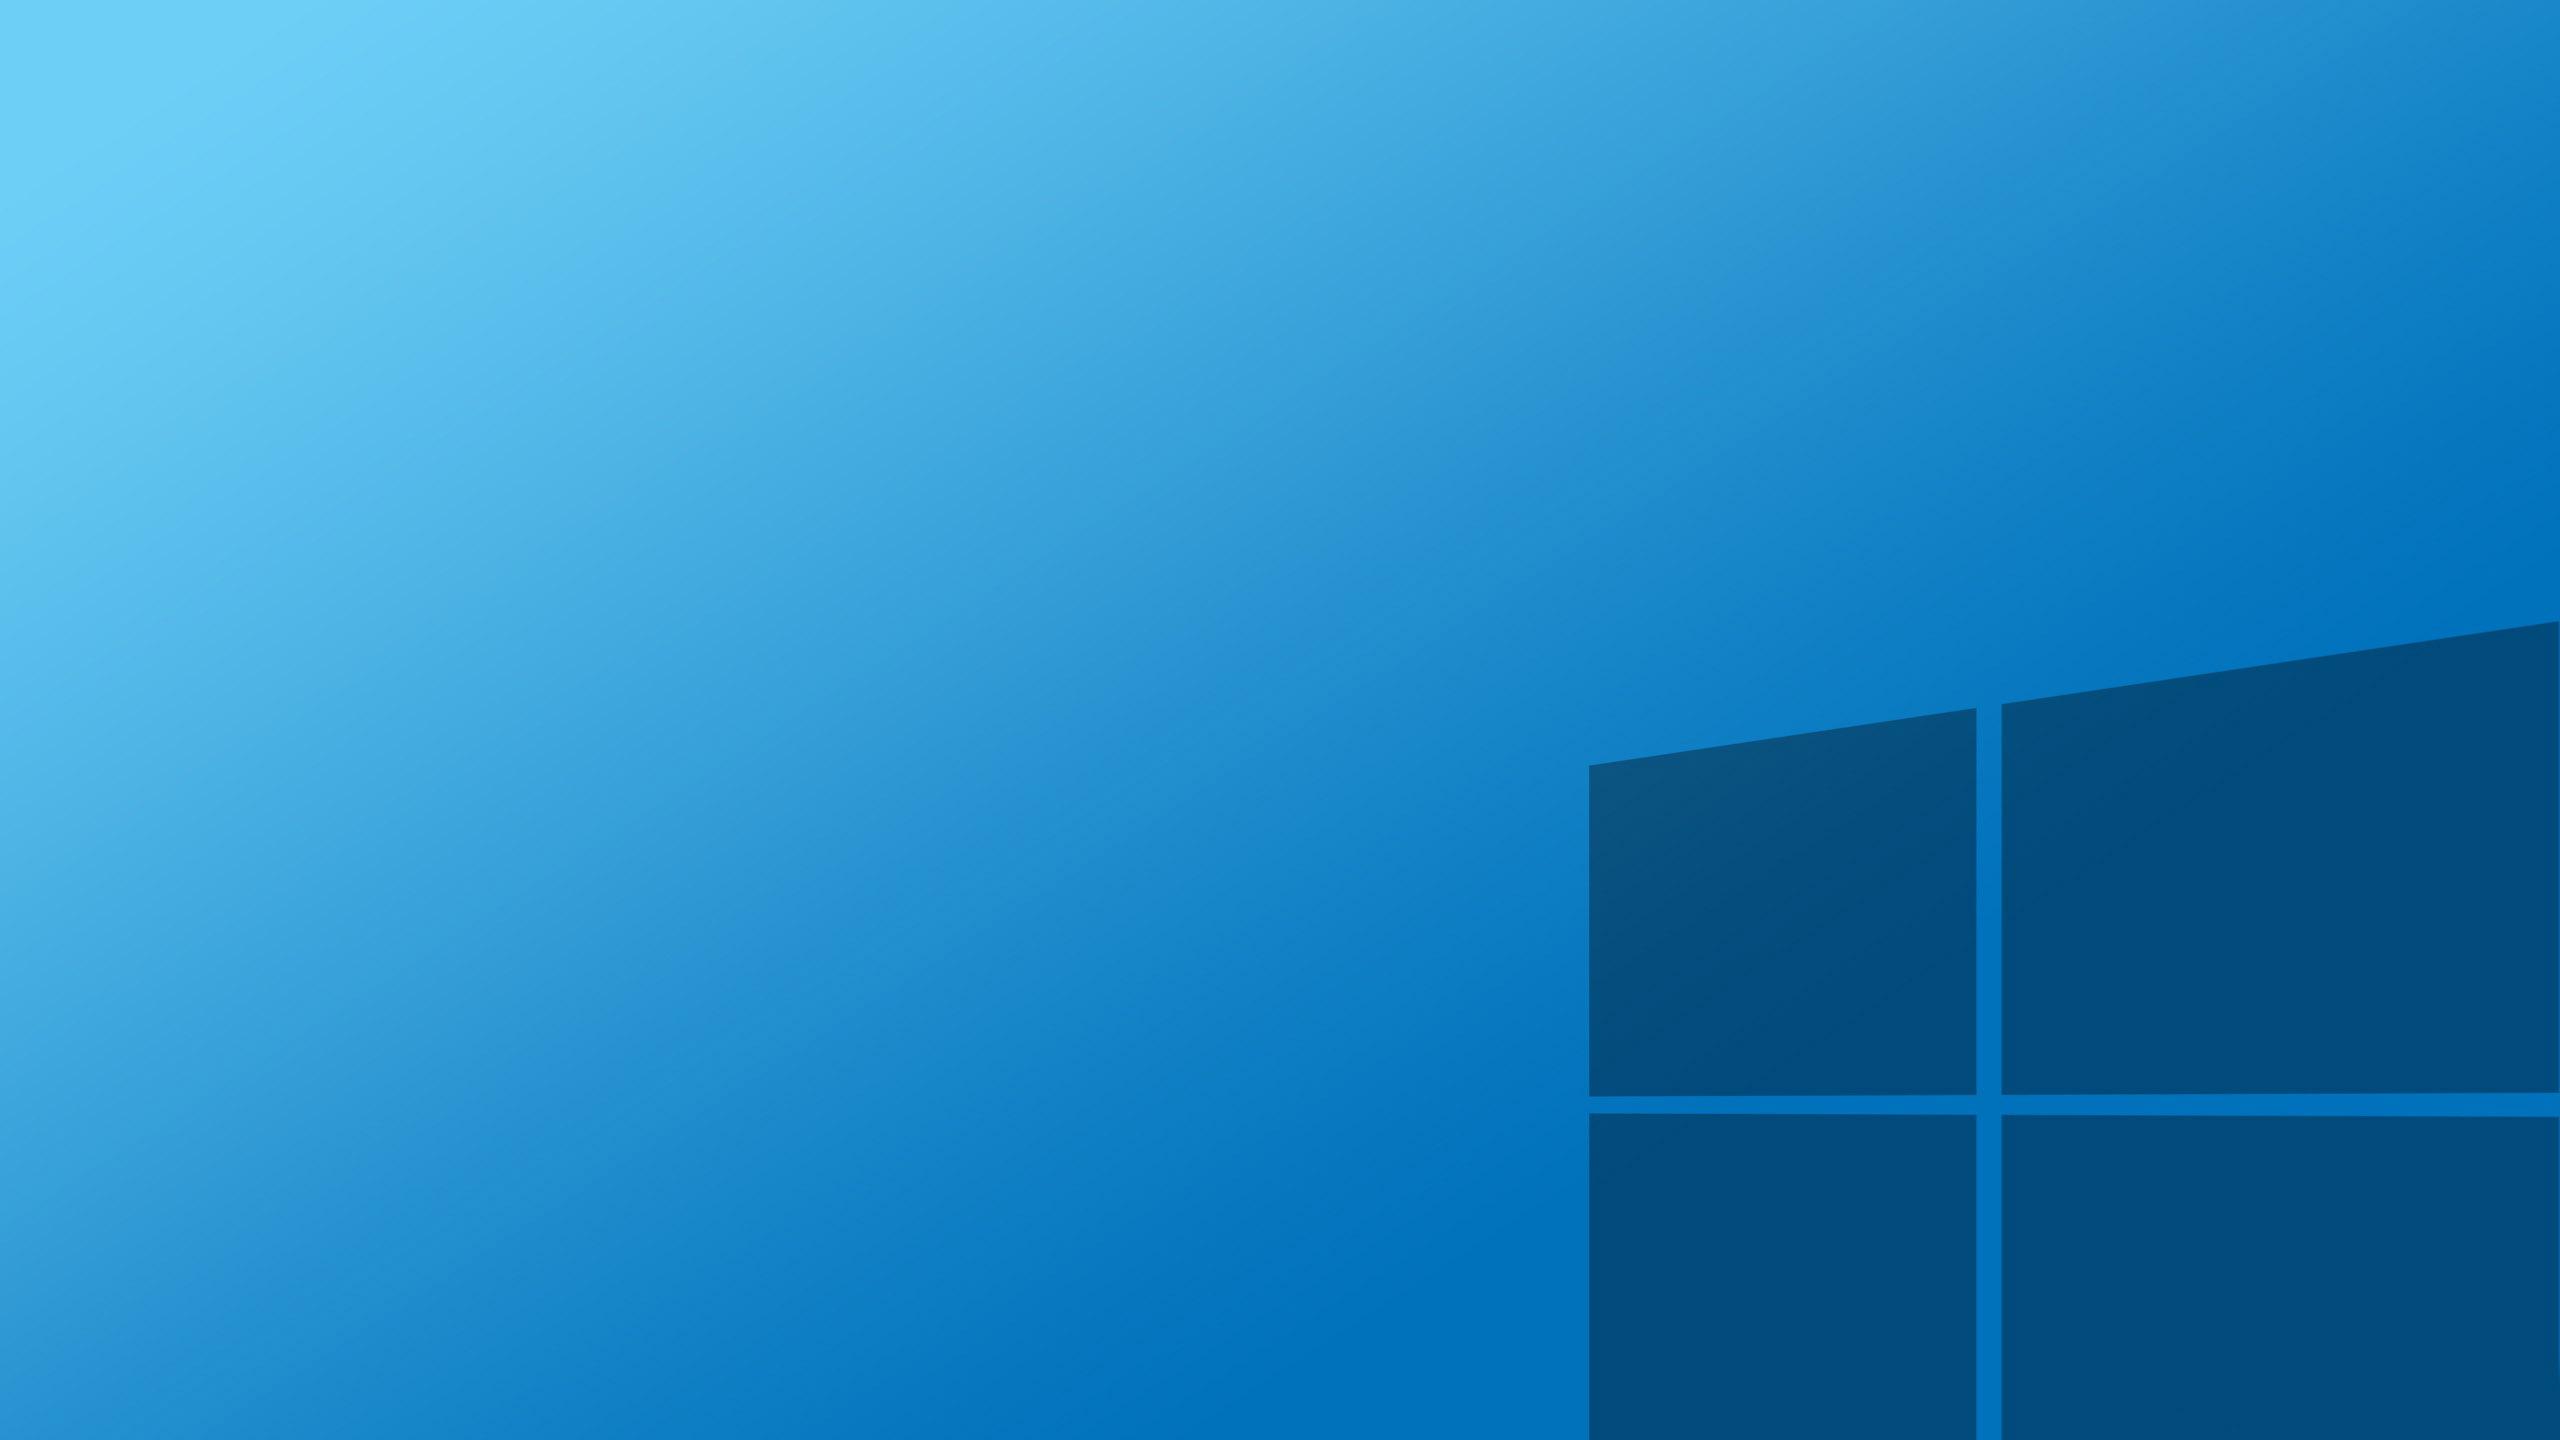 windows 10 wallpapers HD 164 HD Wallpaper   HDWallpaperecom 2560x1440